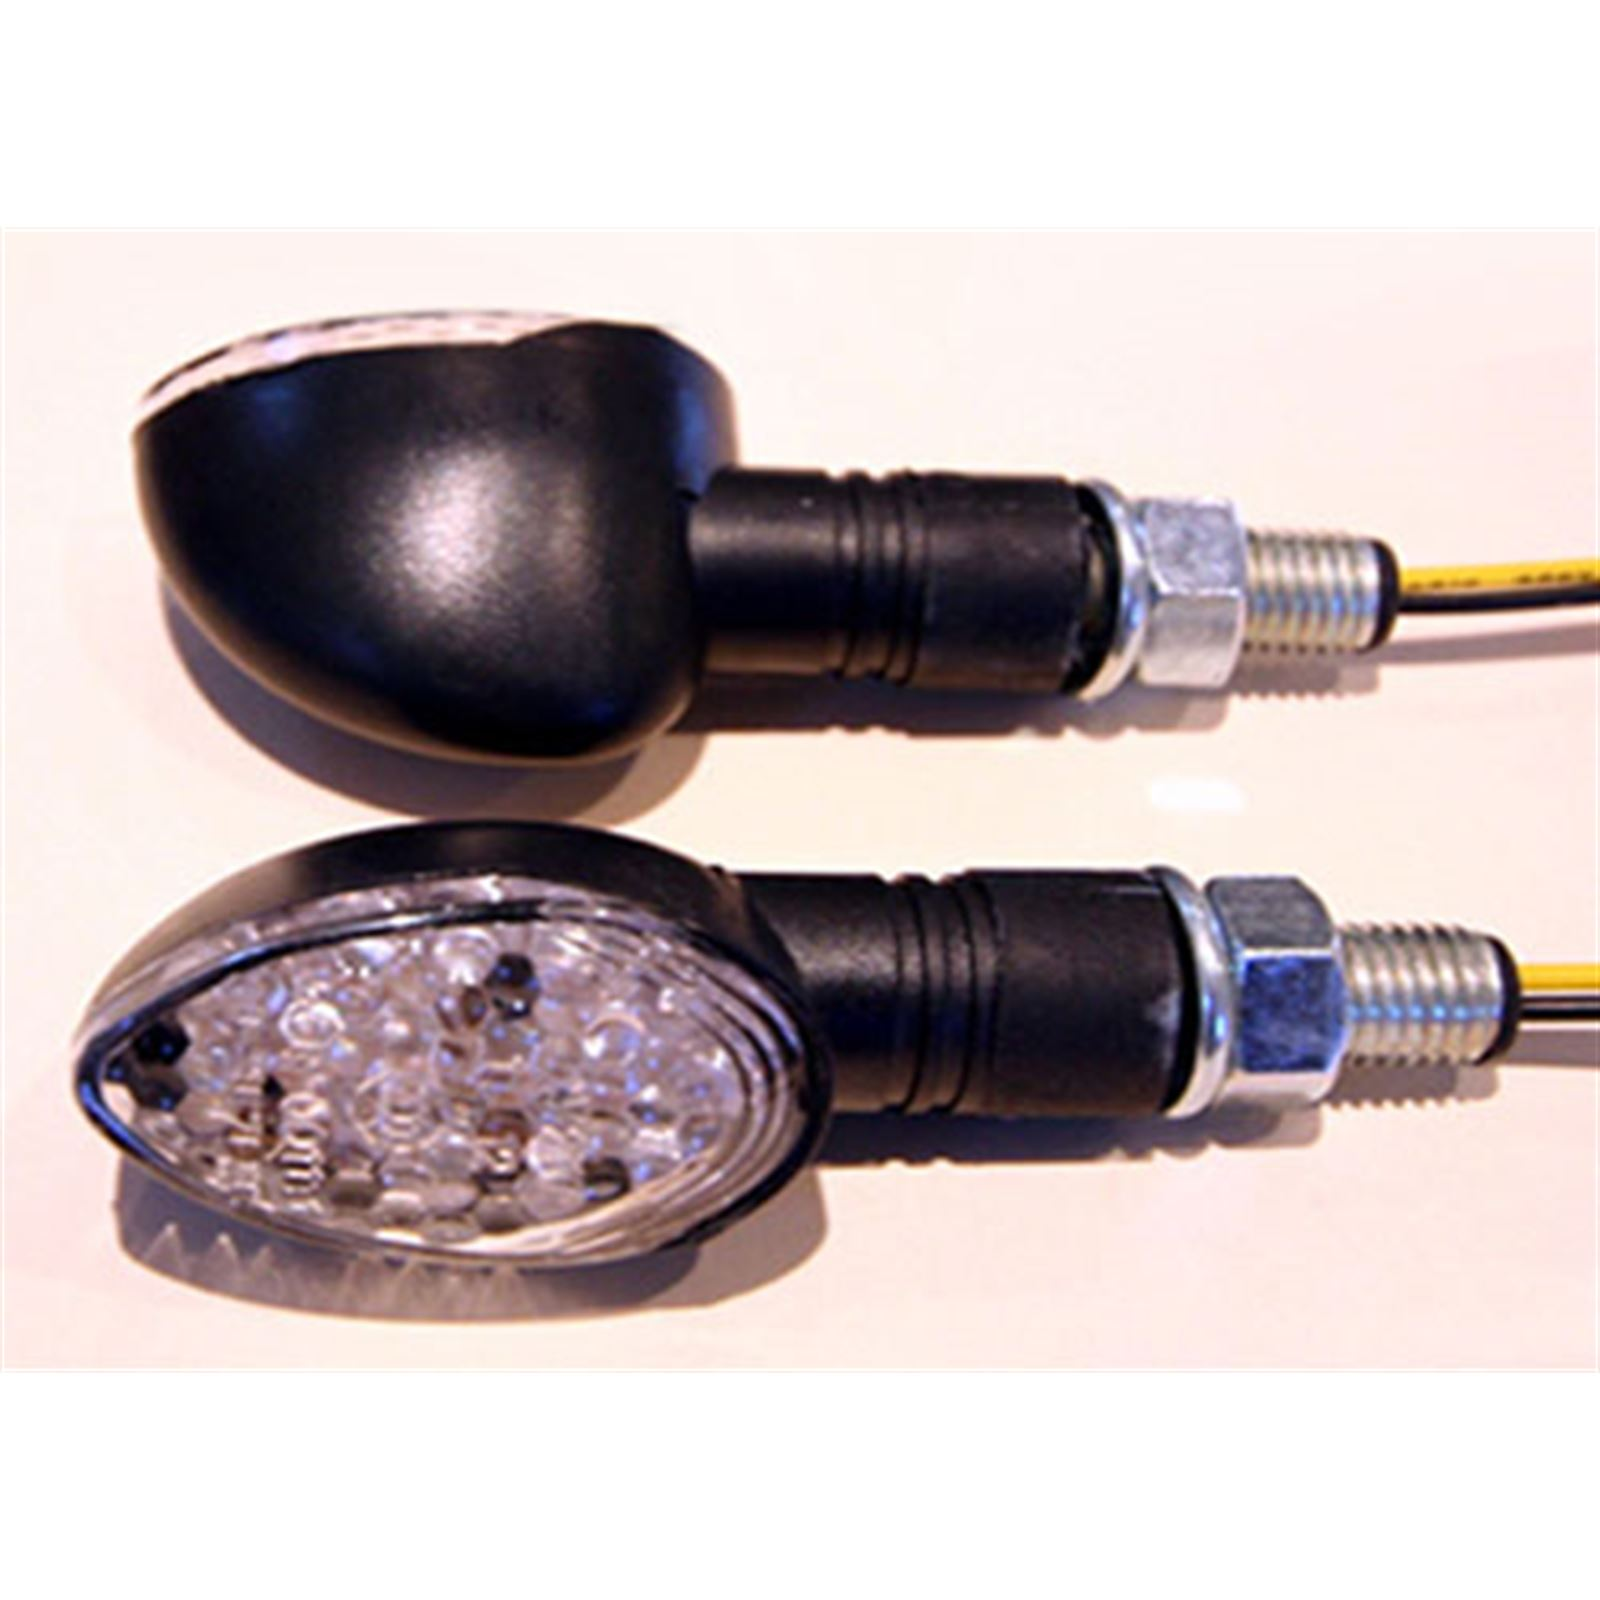 K S Marker Light - Ministalk